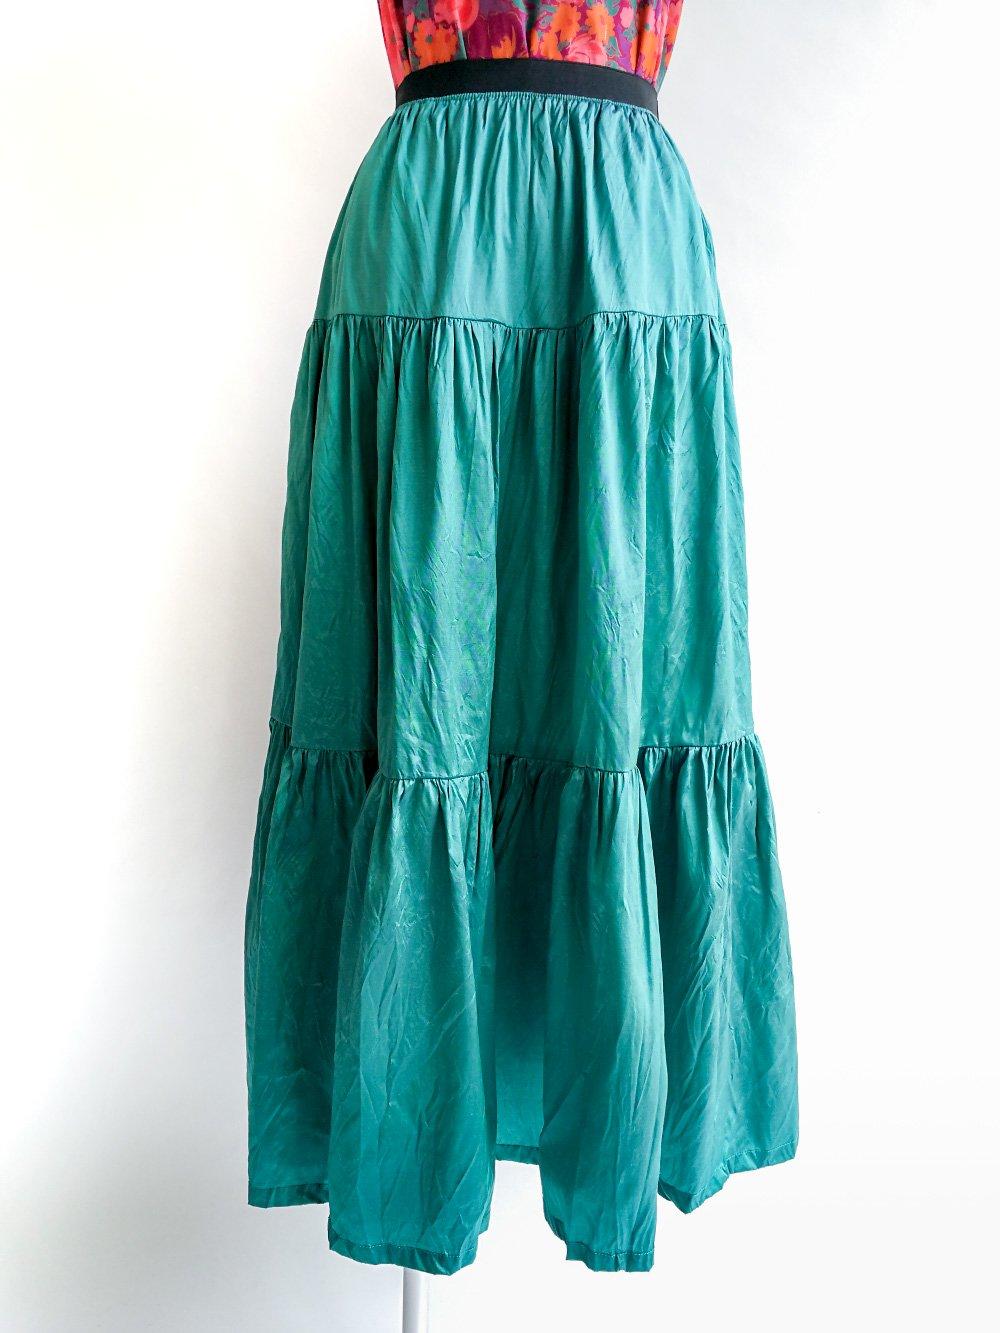 Tiered Skirt / original blue